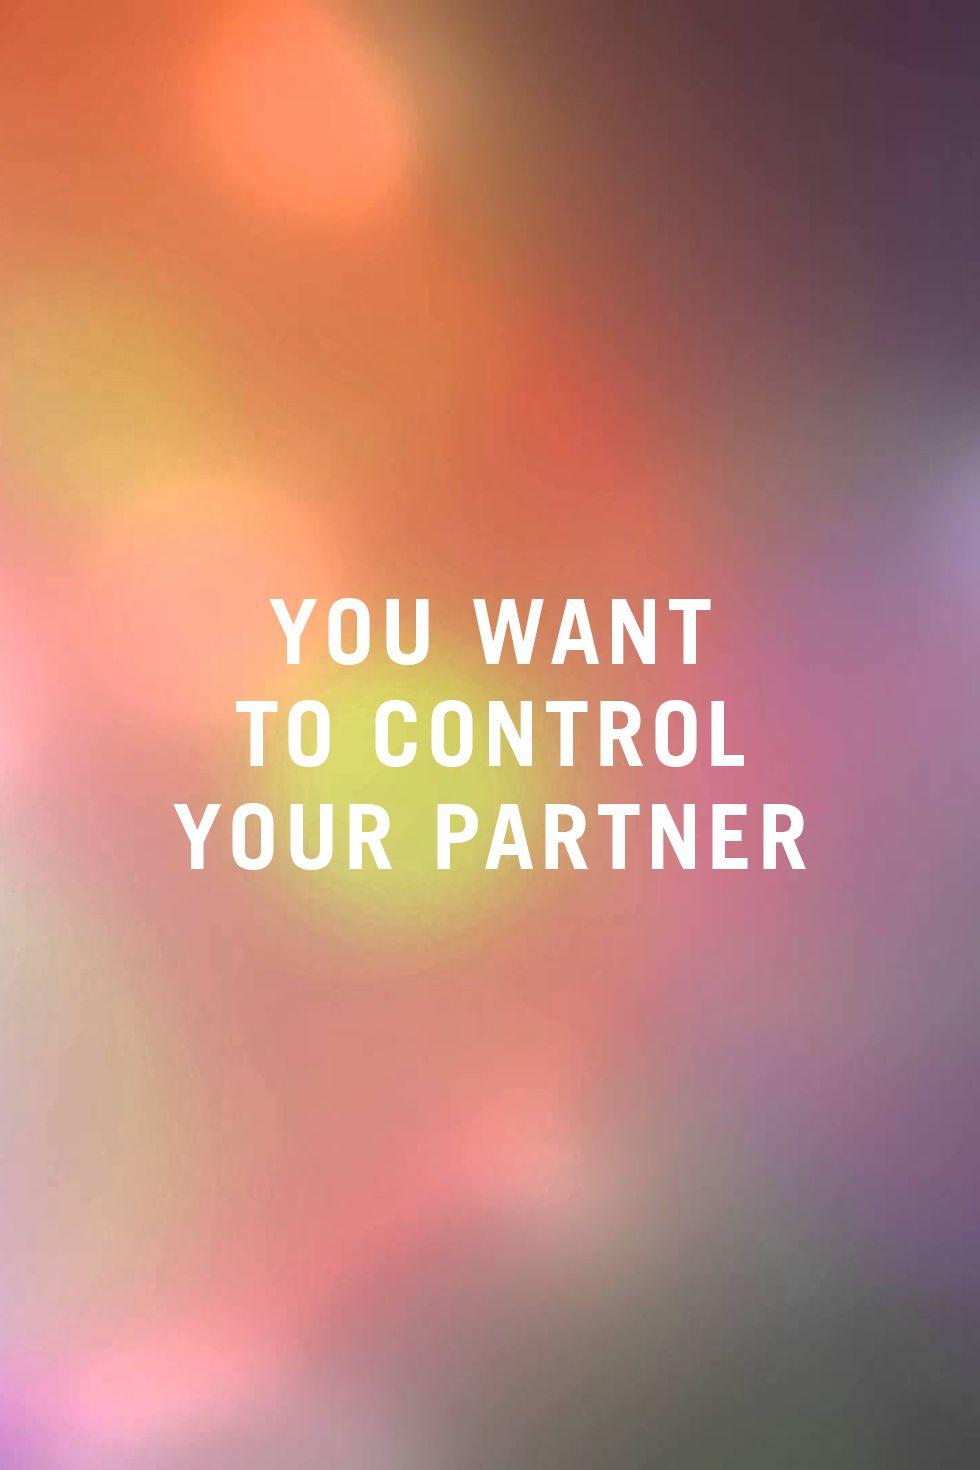 Self sabotaging relationship patterns in dating